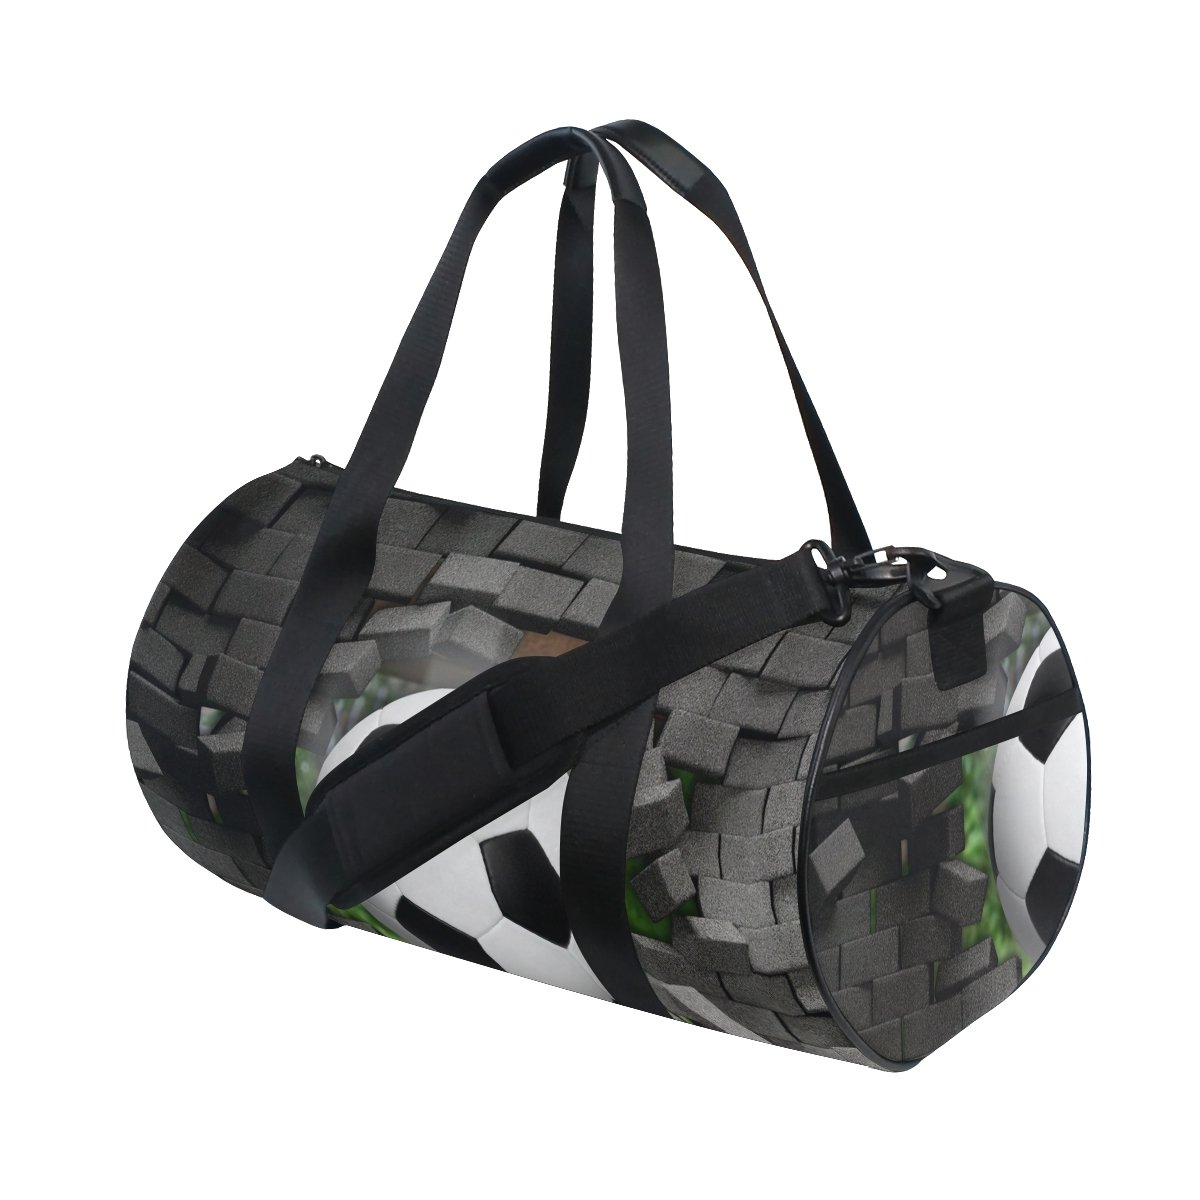 Naanle Soccer Broken Brick Wall Pattern Ameican Football Gym bag Sports Travel Duffle Bags for Men Women Boys Girls Kids